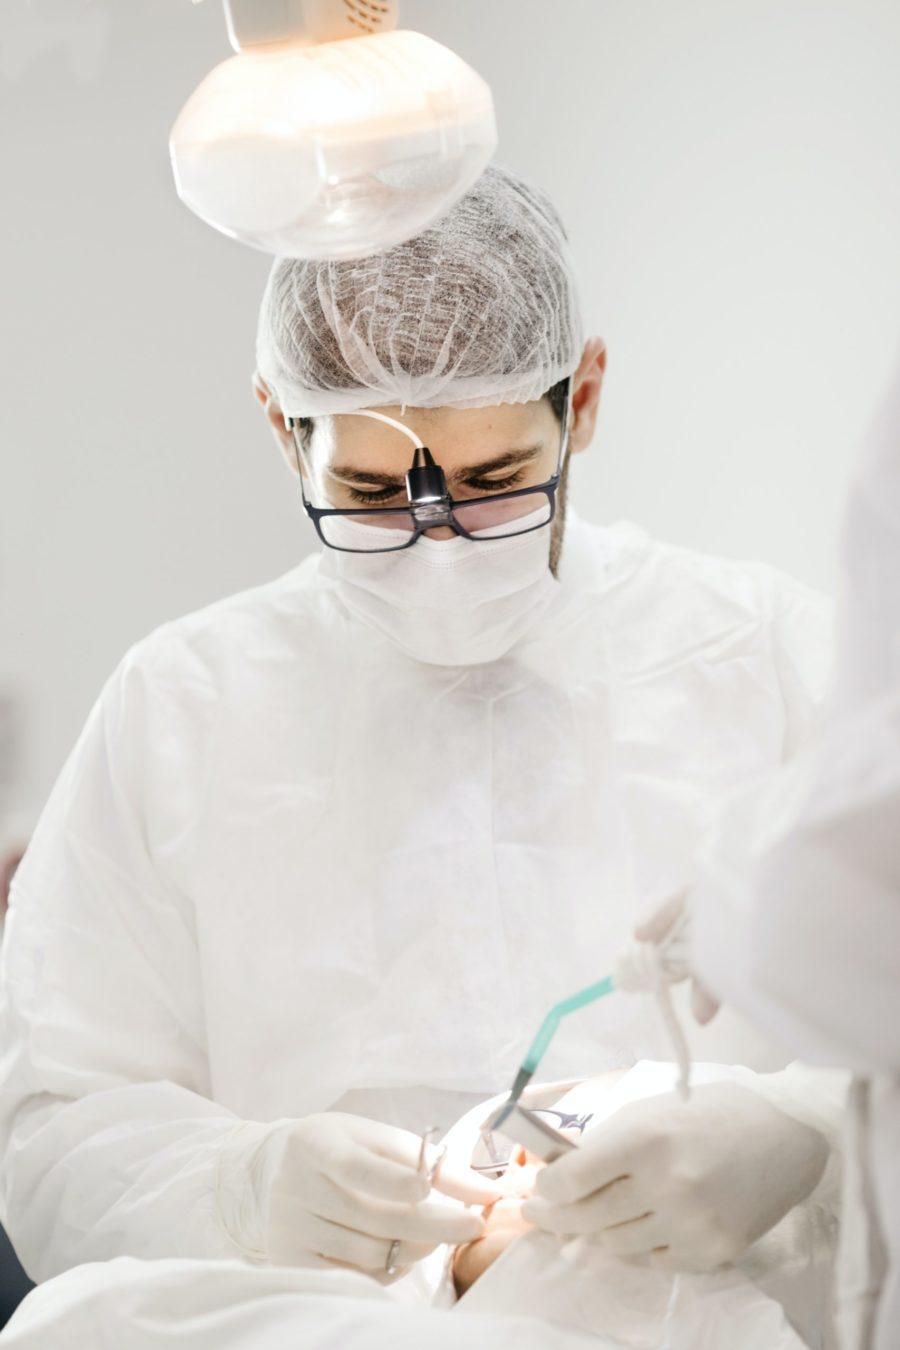 Dental-filling-by-dr-monica-crooks-dentist-sacramento-california